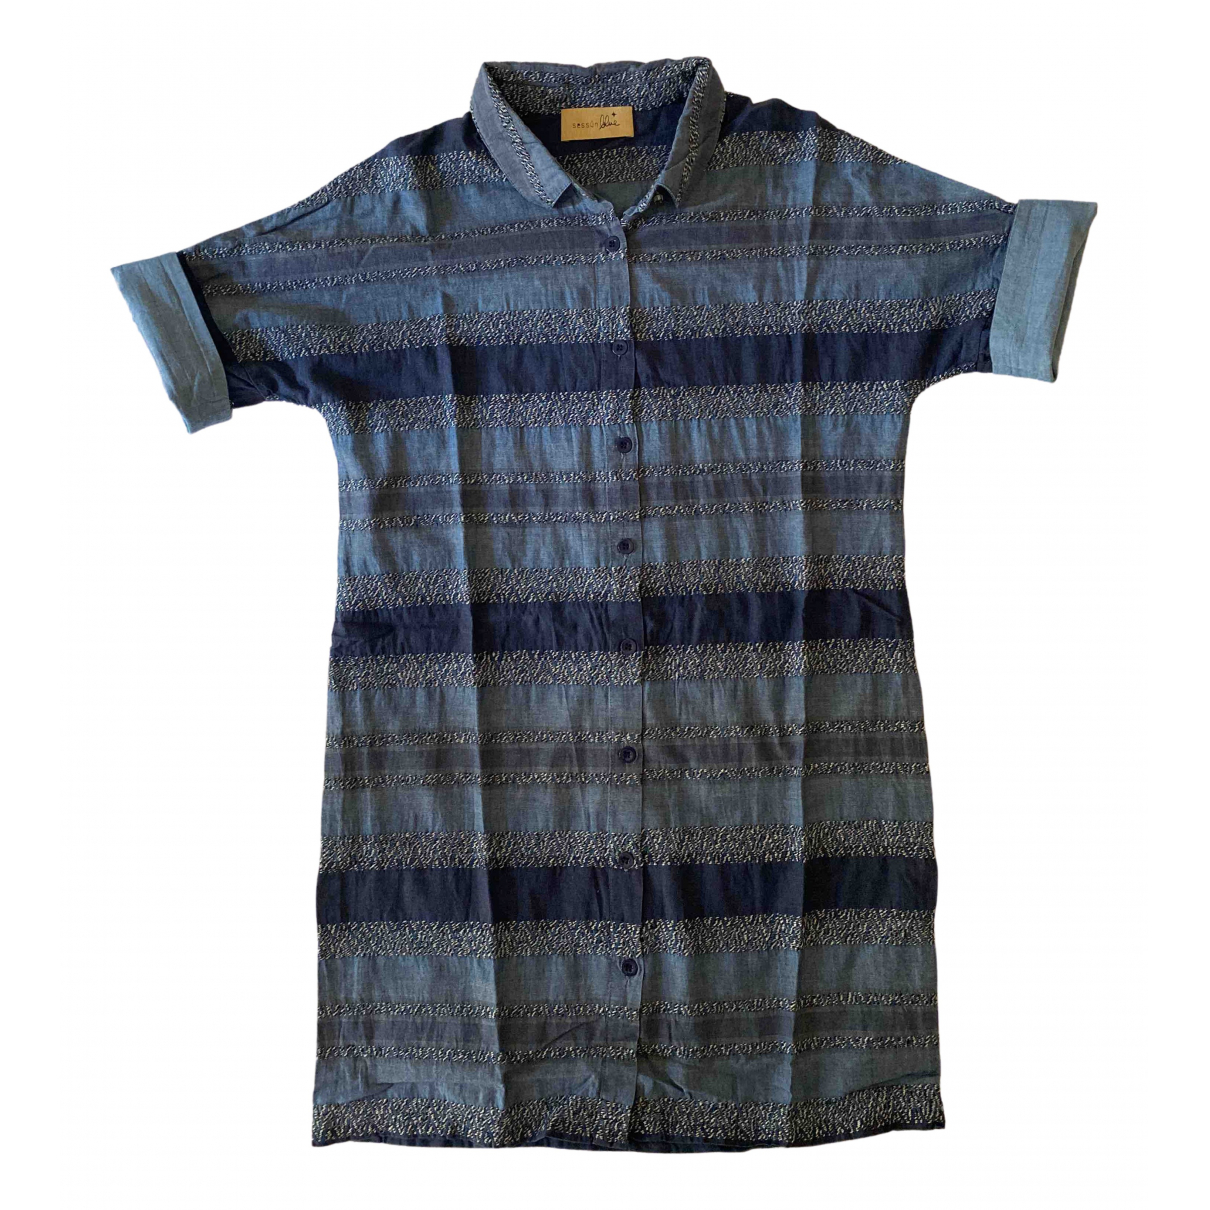 Sessun \N Blue Cotton dress for Women M International